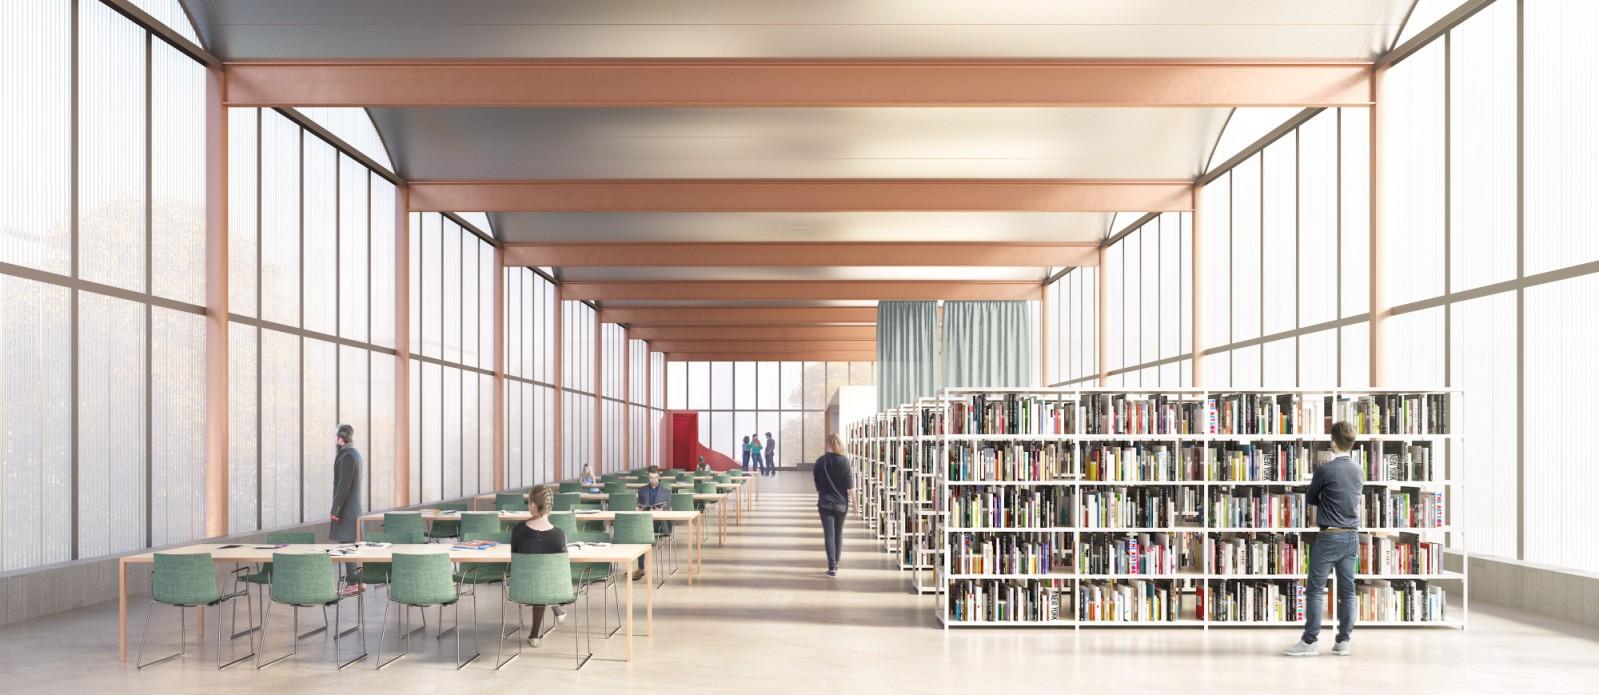 Urtzi Grau Wins International Design Competition New Library